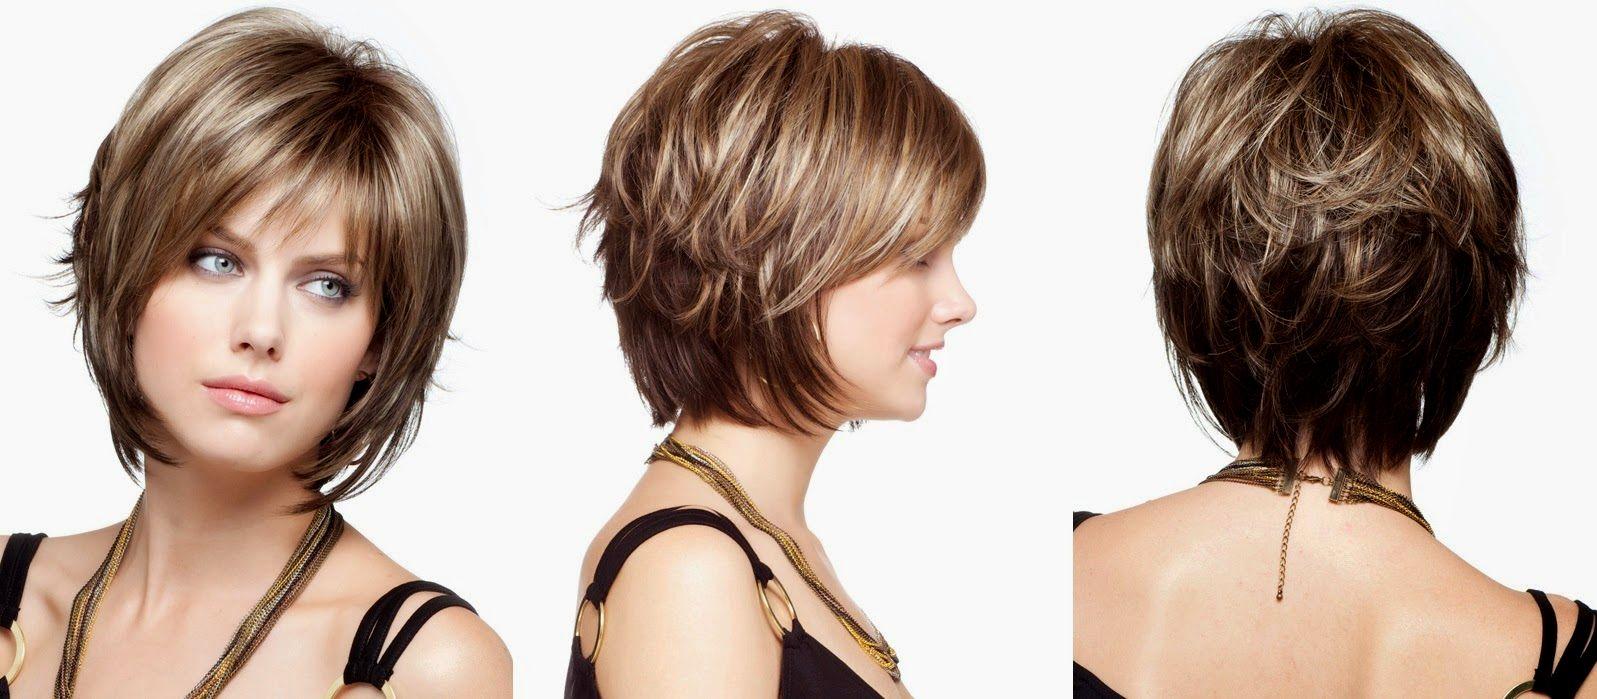 beautiful ver corte de cabelo curto feminino online-Lovely Ver Corte De Cabelo Curto Feminino Fotografia